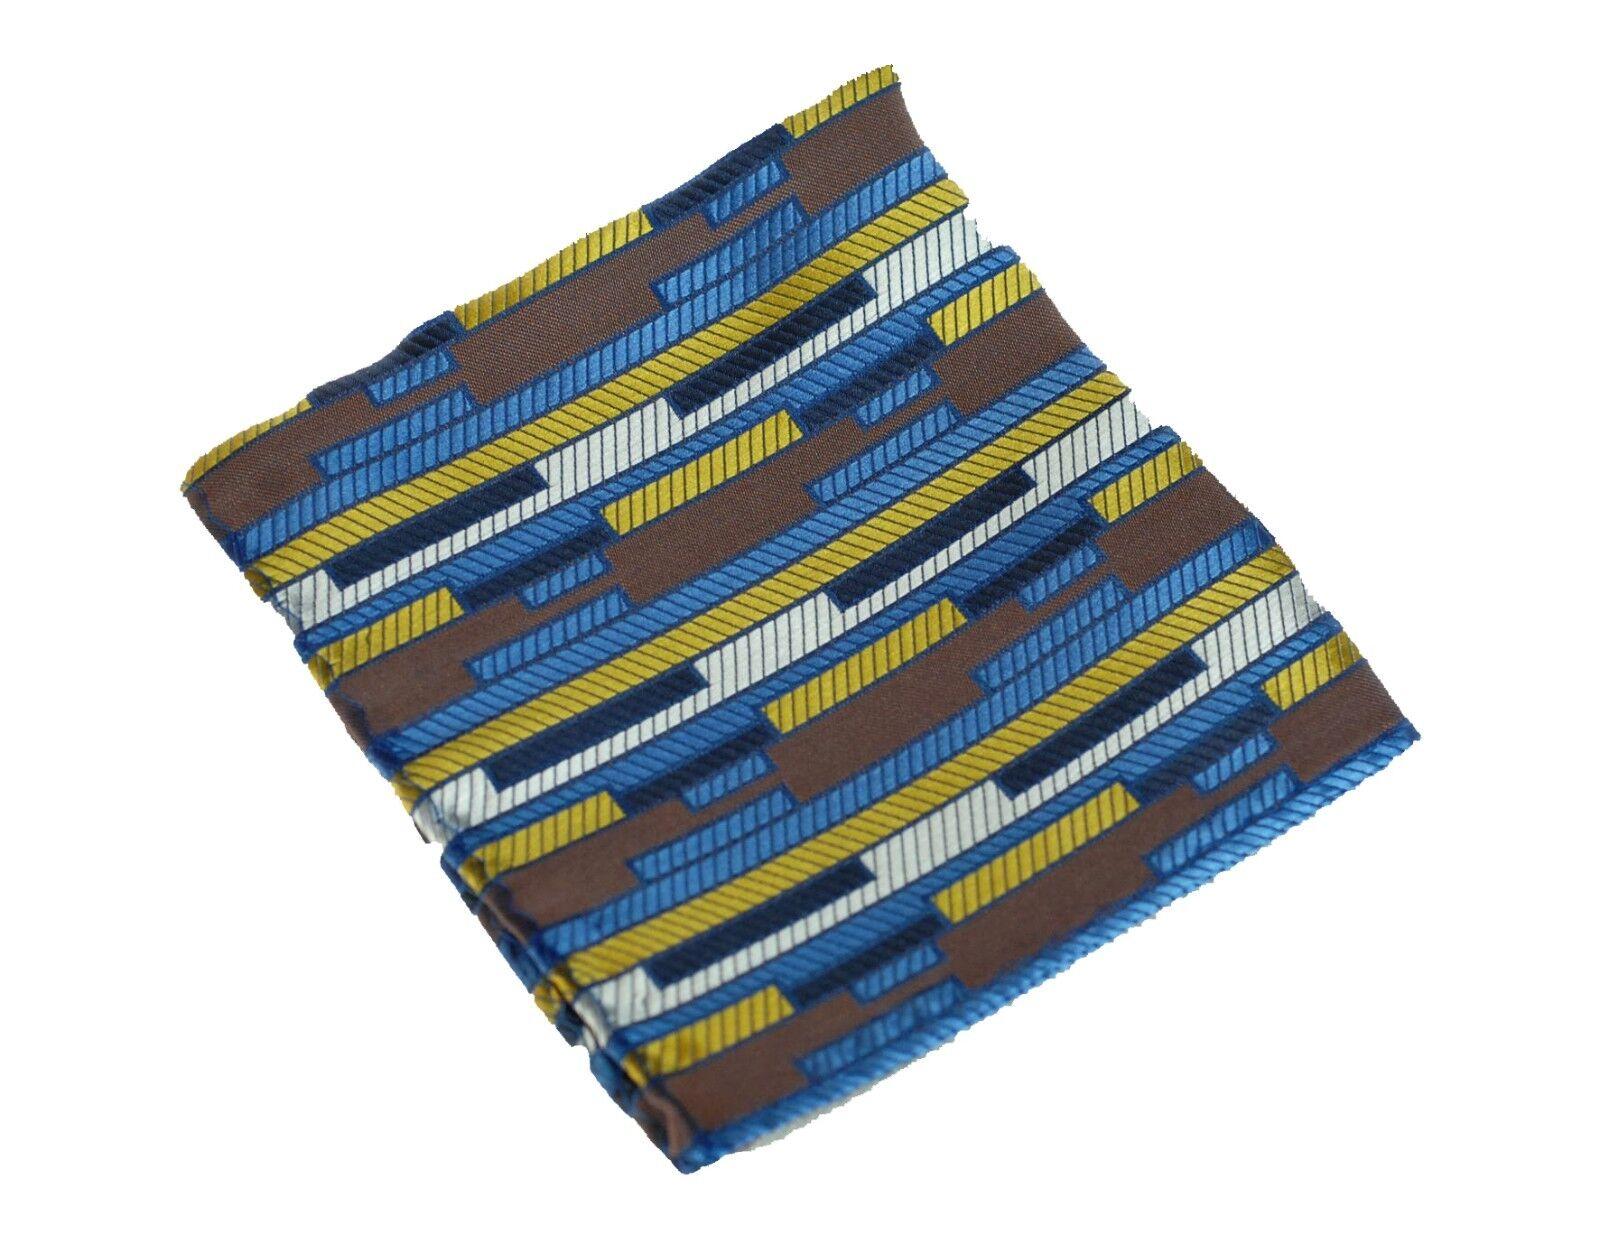 Lord R Colton Masterworks Pocket Square Miami Brown Blue Silk - Retail New